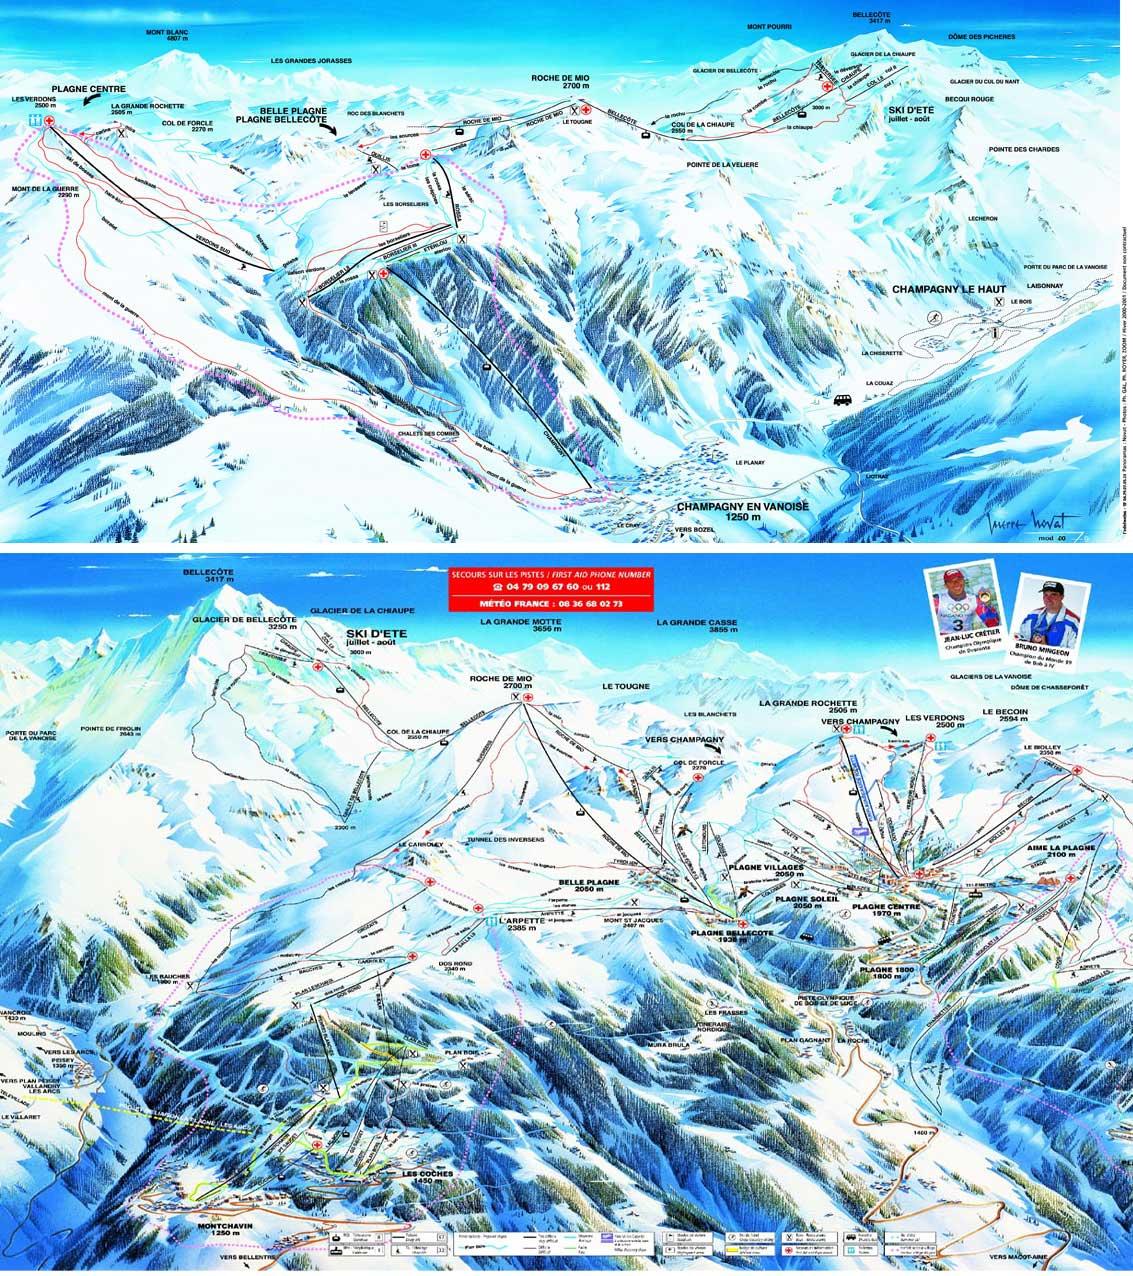 Les Coches Piste / Trail Map